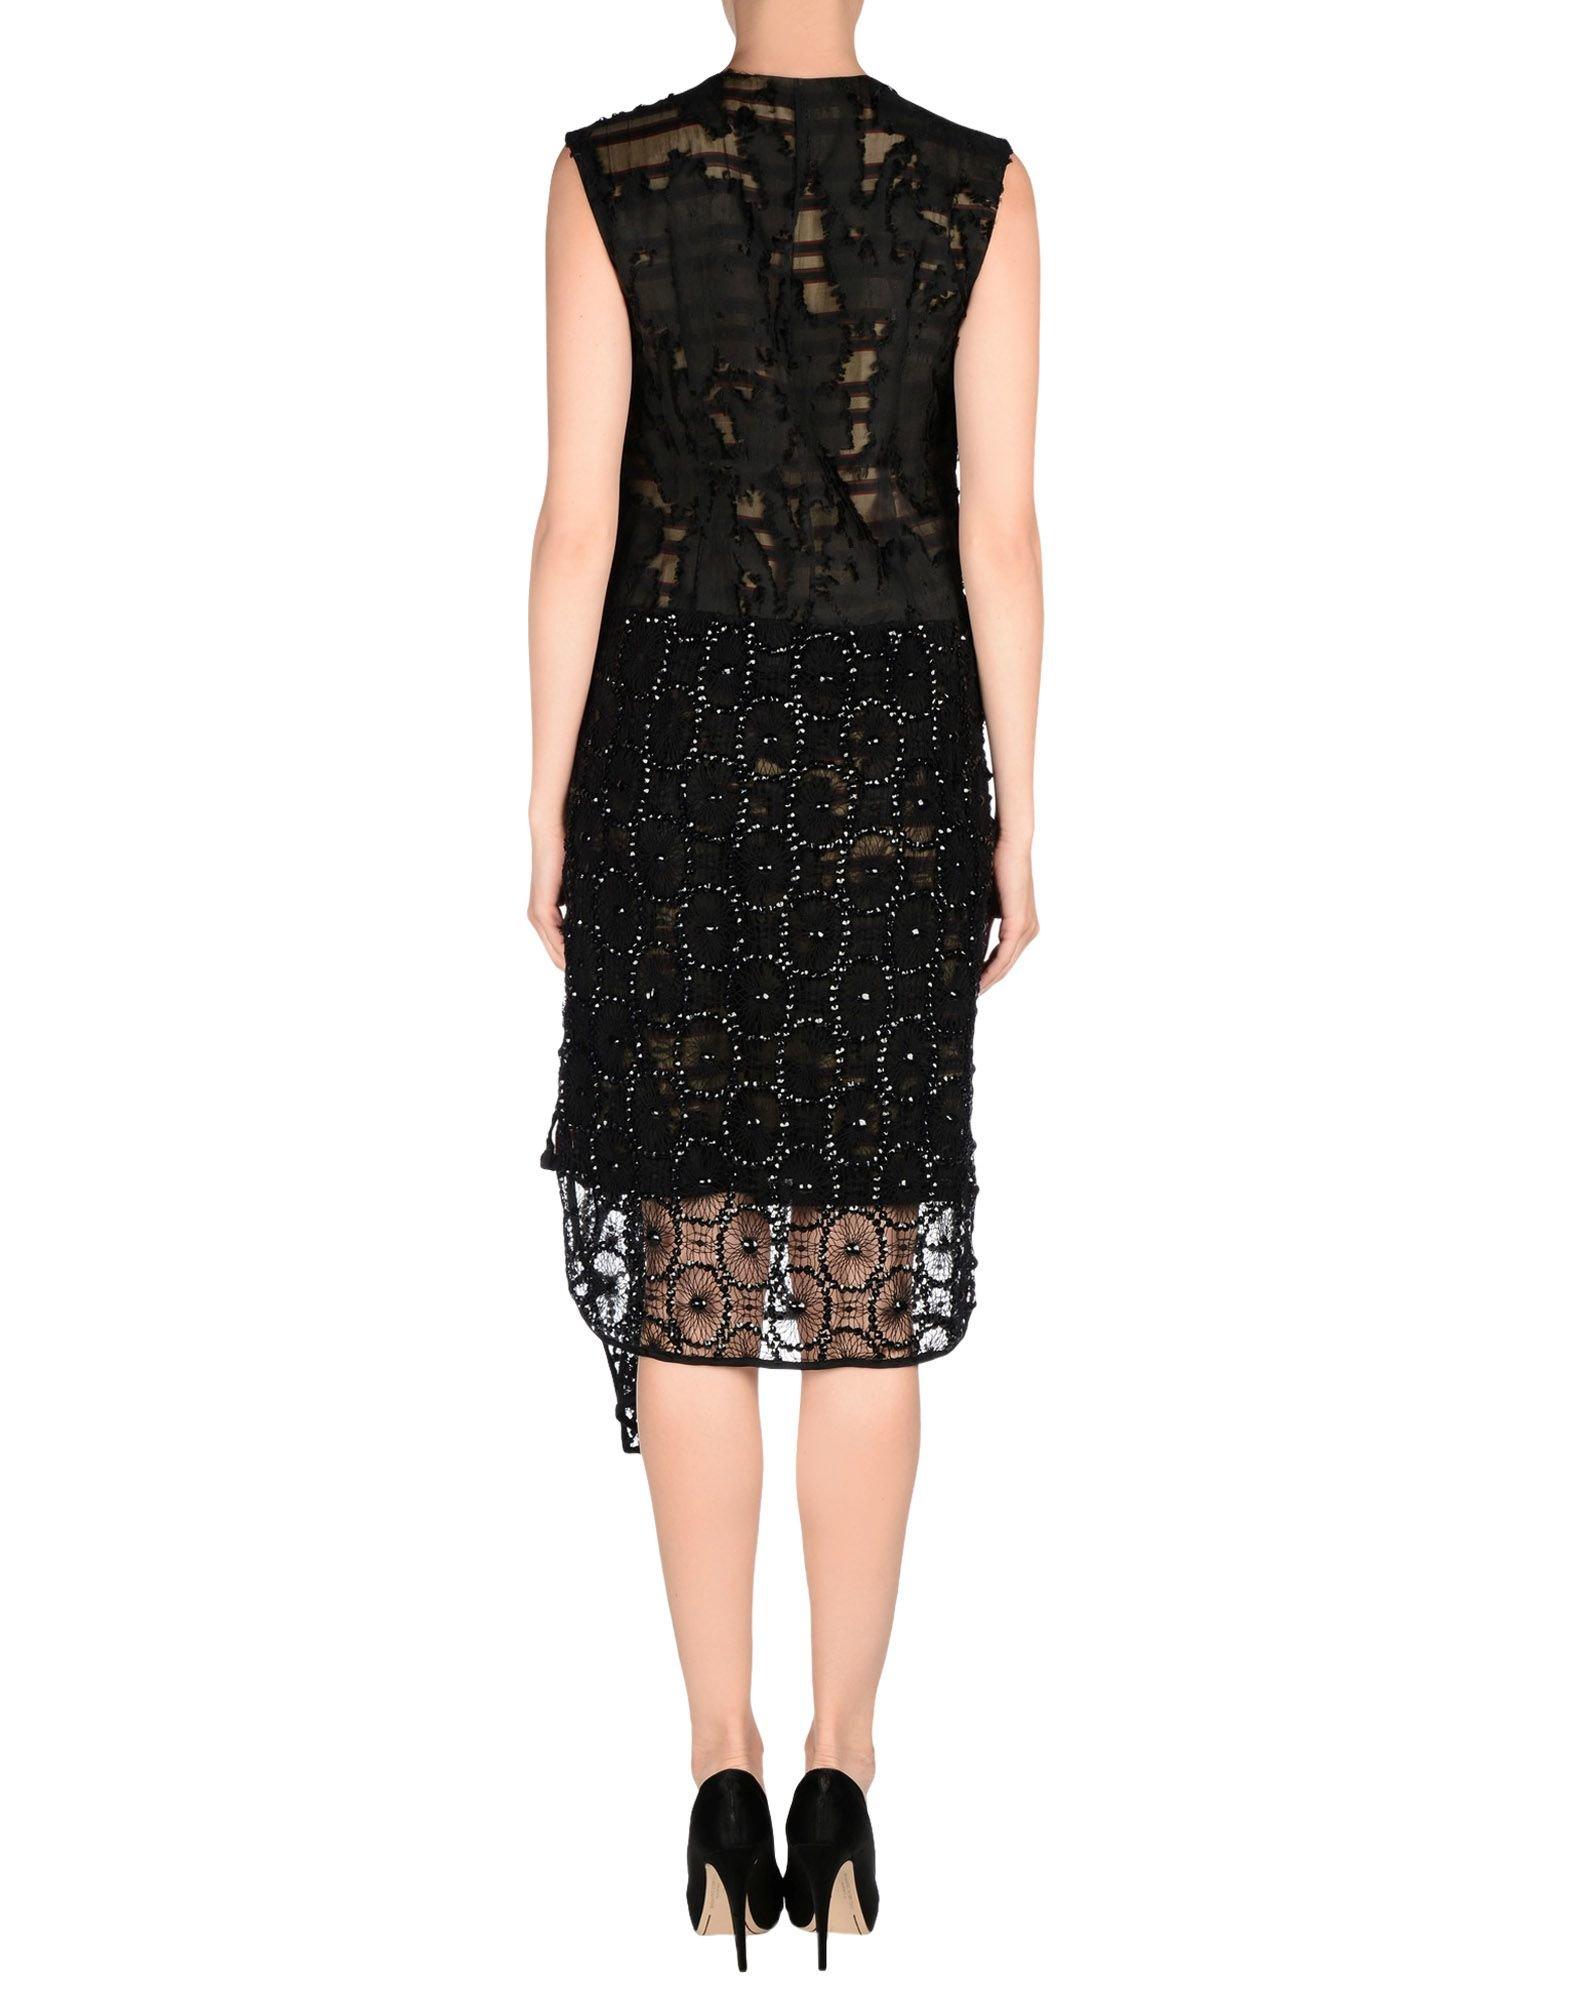 plus size dresses macys - Mersn.proforum.co